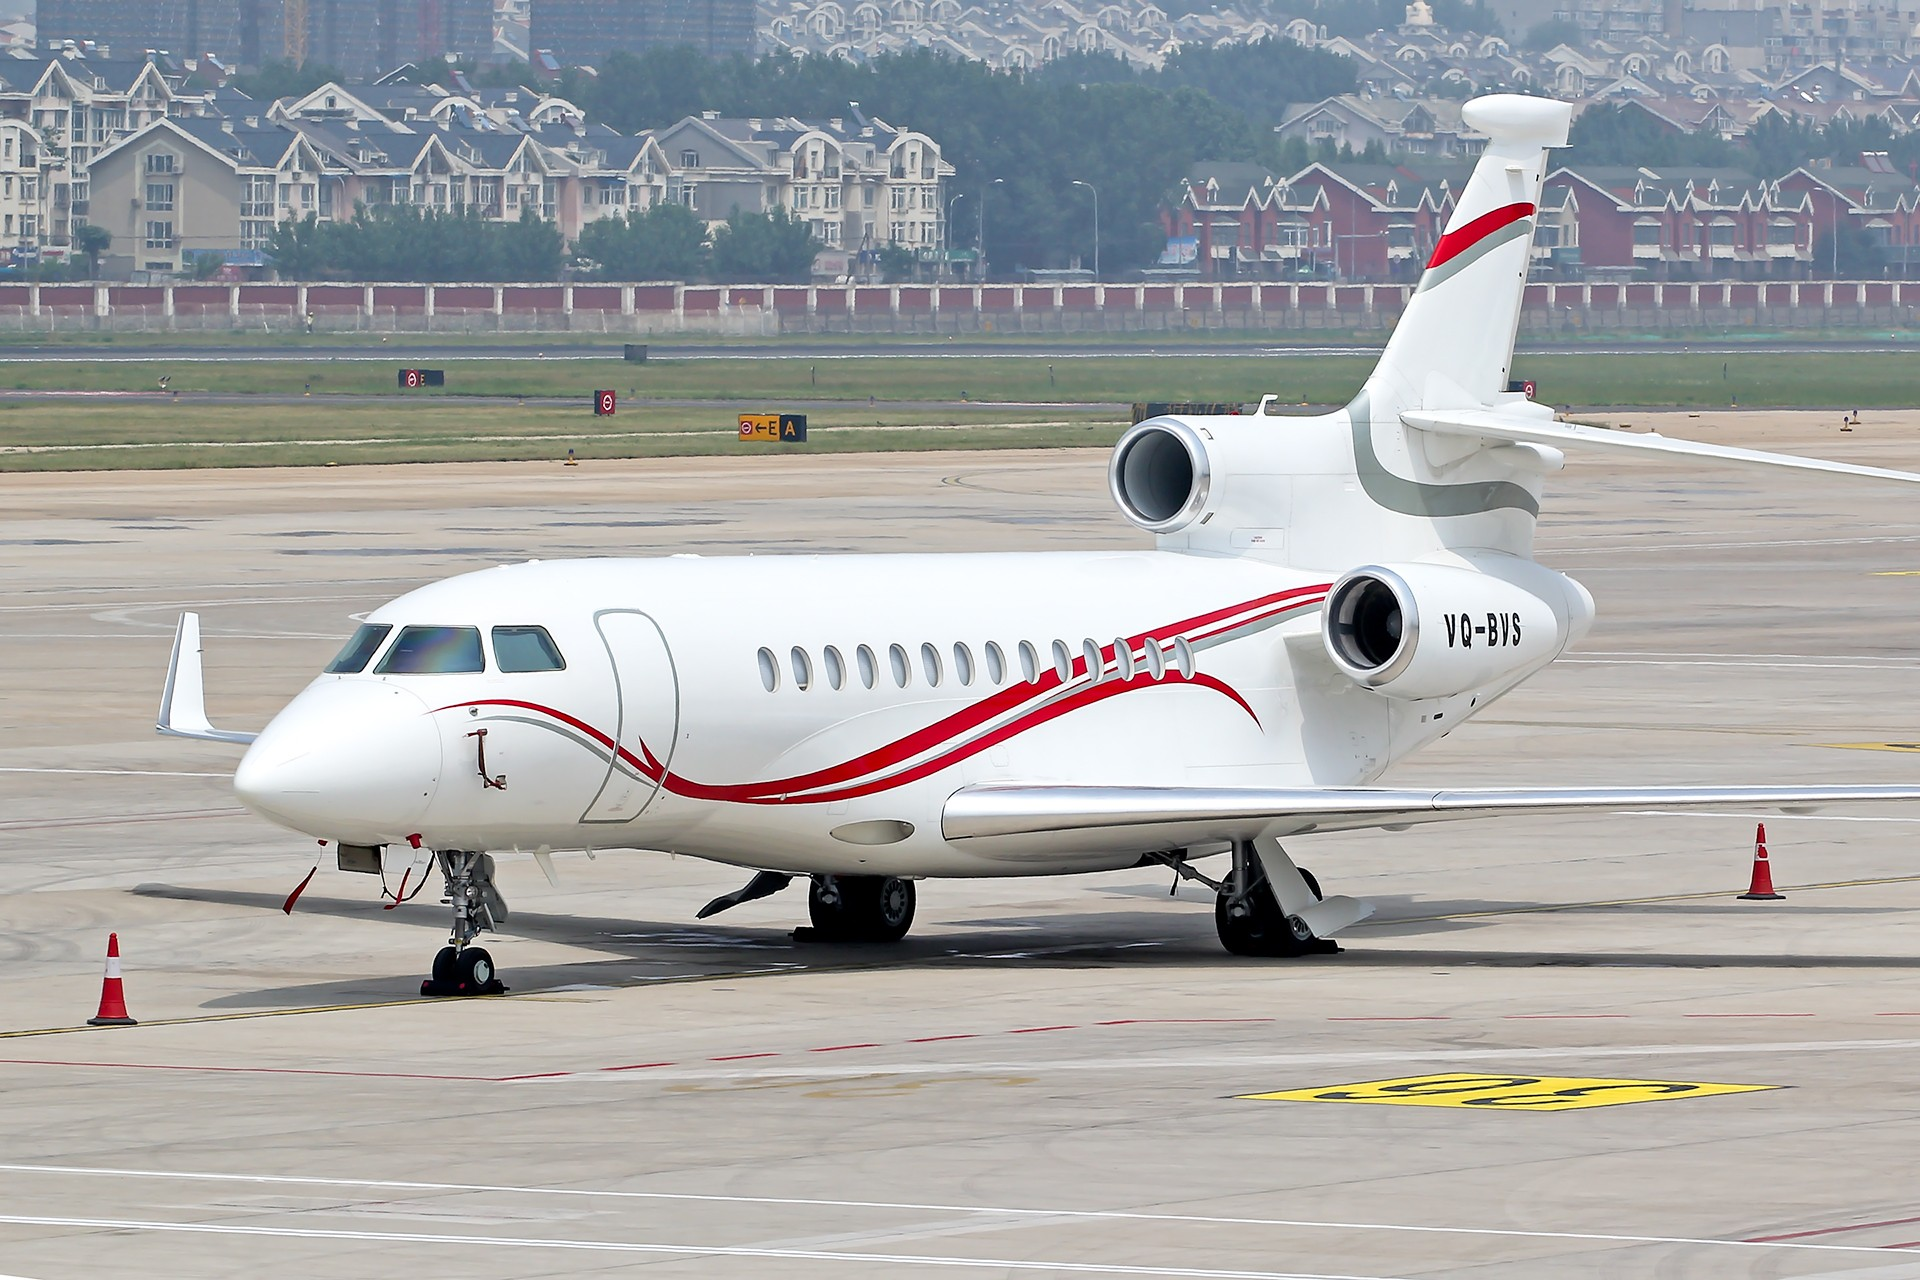 [原创]Dassault Falcon 7X DASSAULT FALCON 7X VQ-BVS 中国大连周水子国际机场